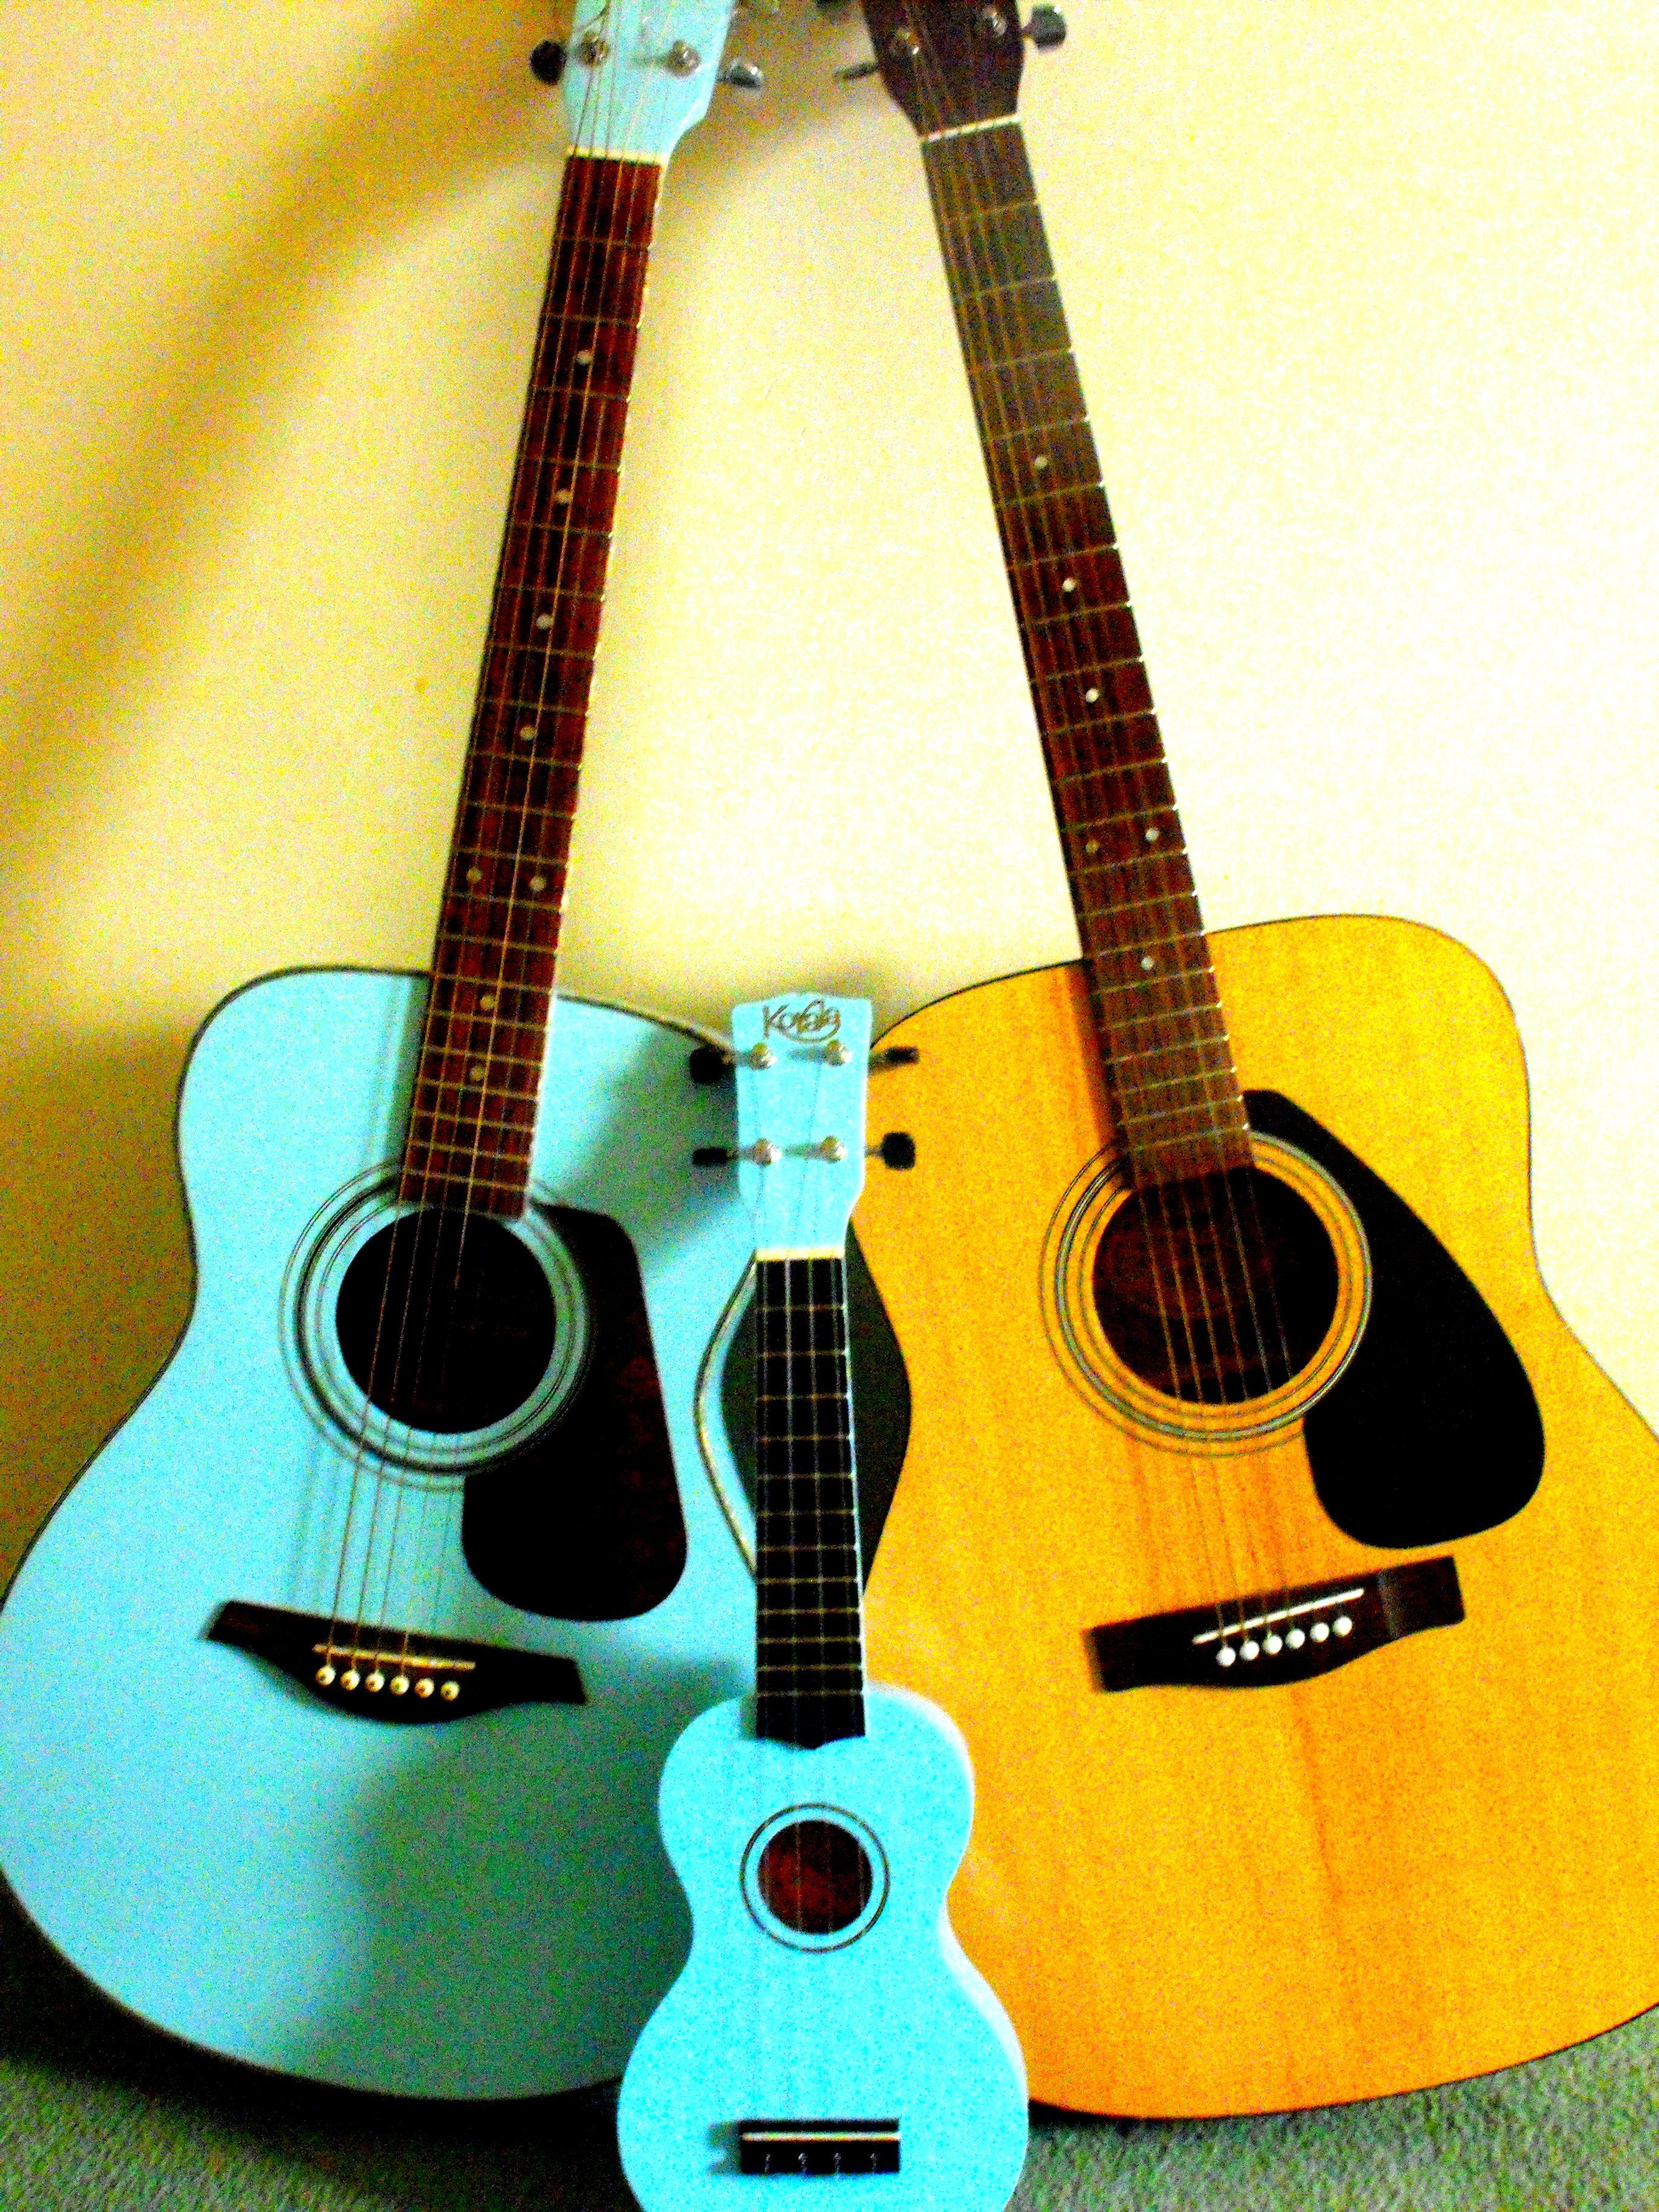 Mummy guitar daddy guitar and baby ukulele guitar